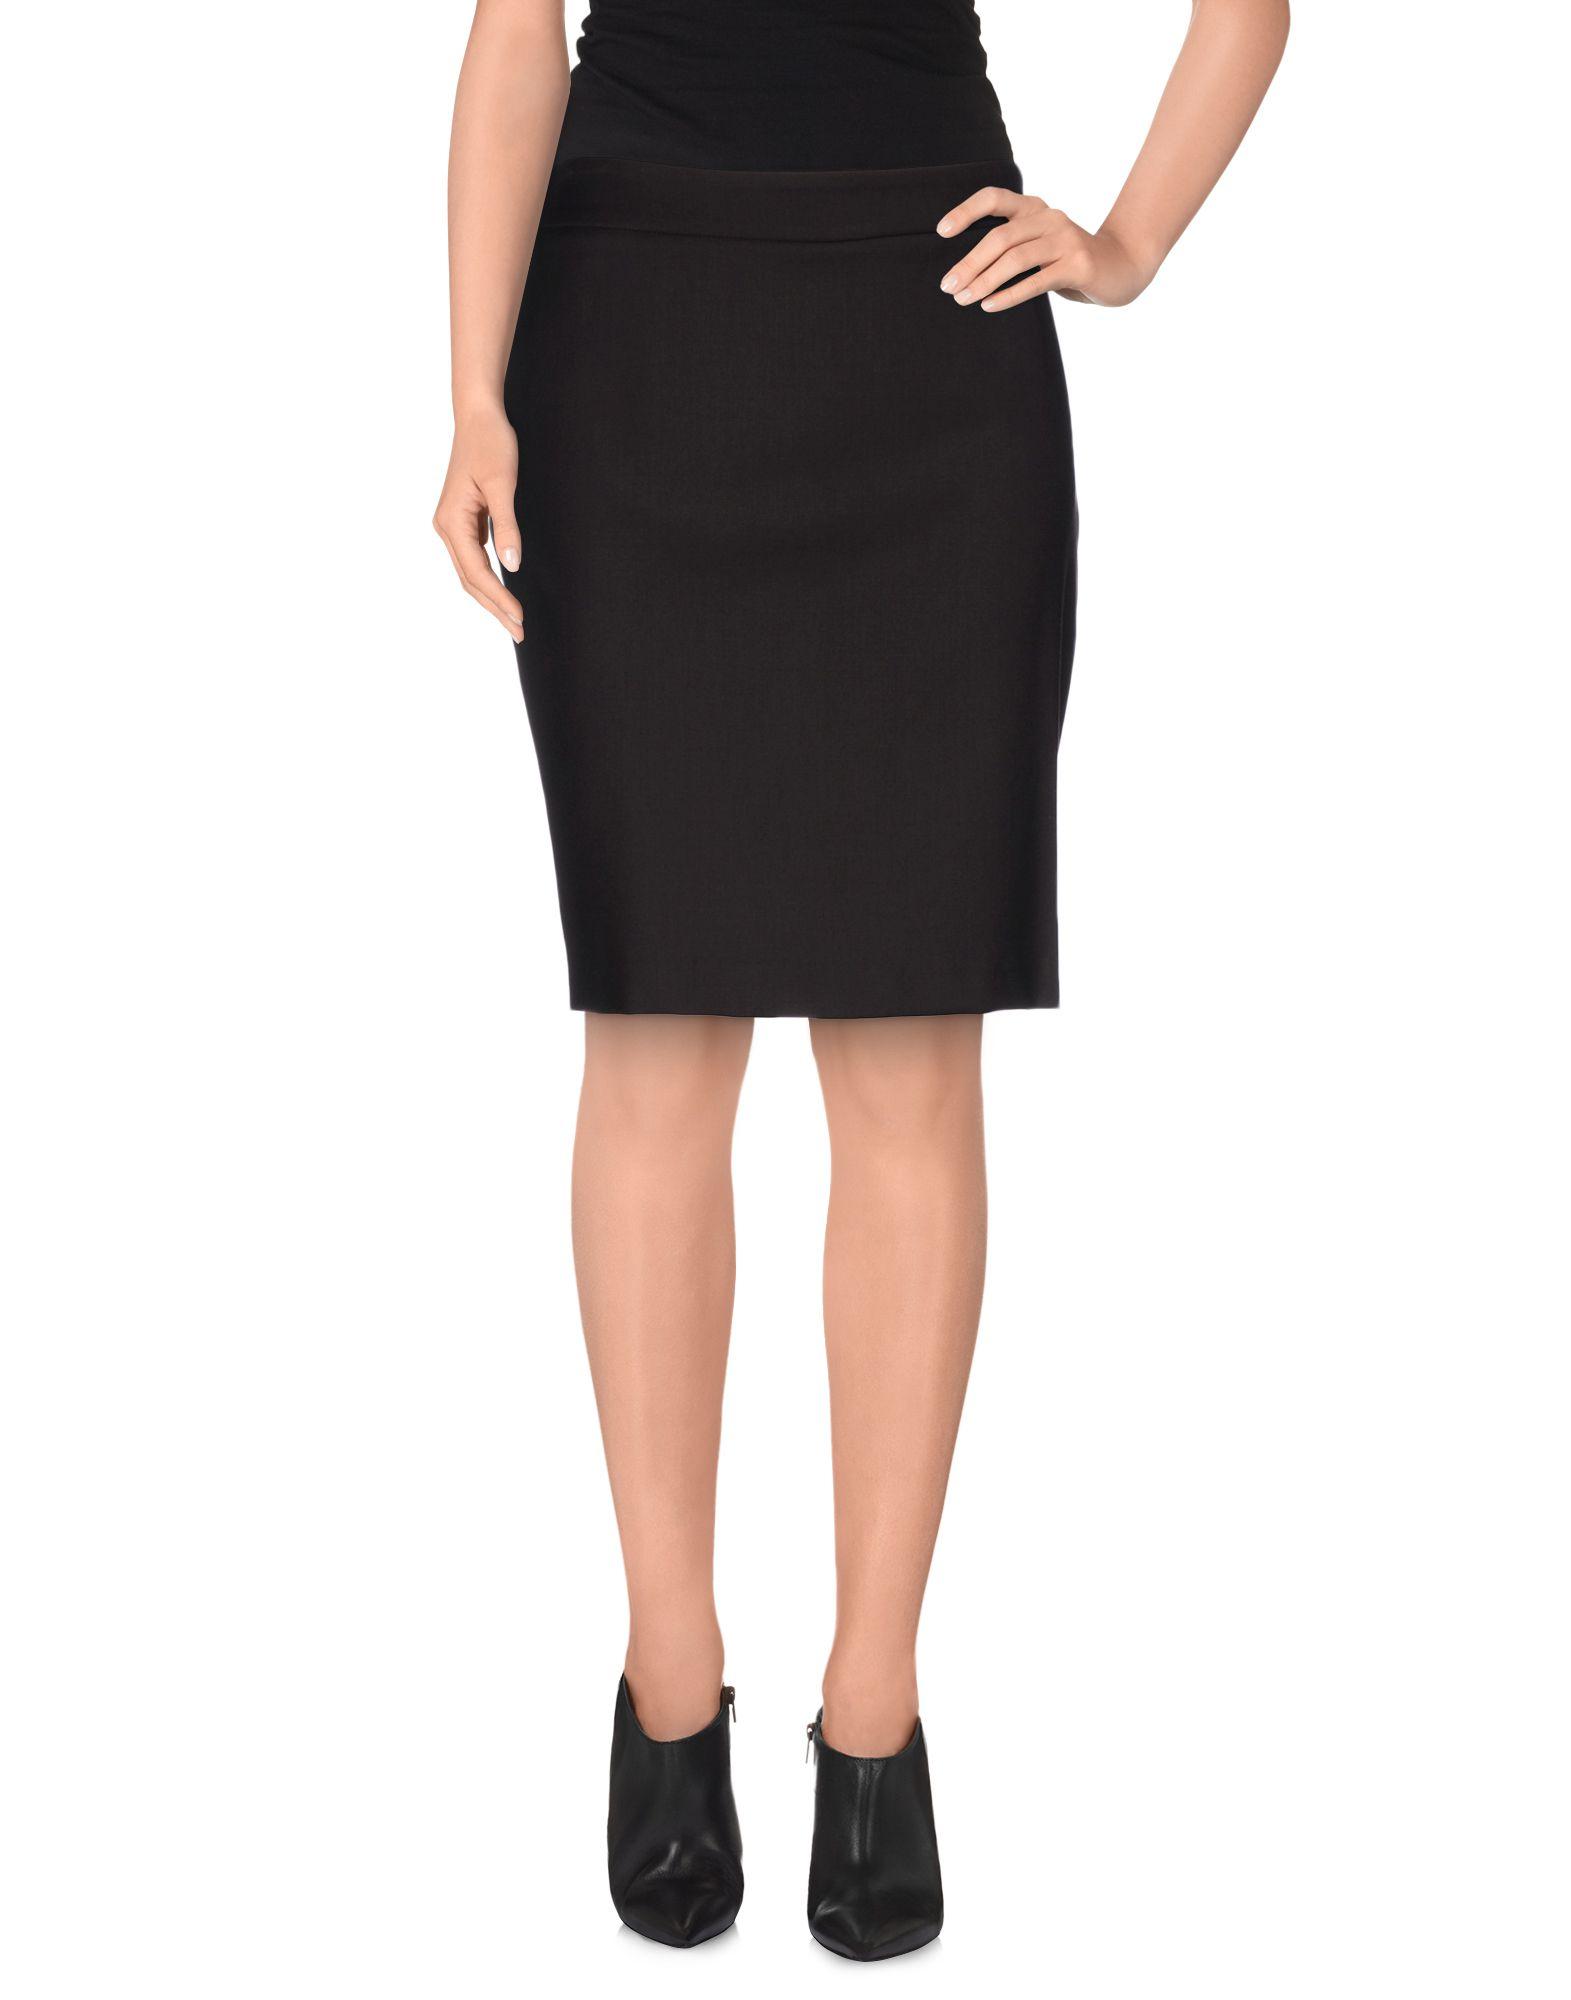 divina knee length skirt in brown brown save 51